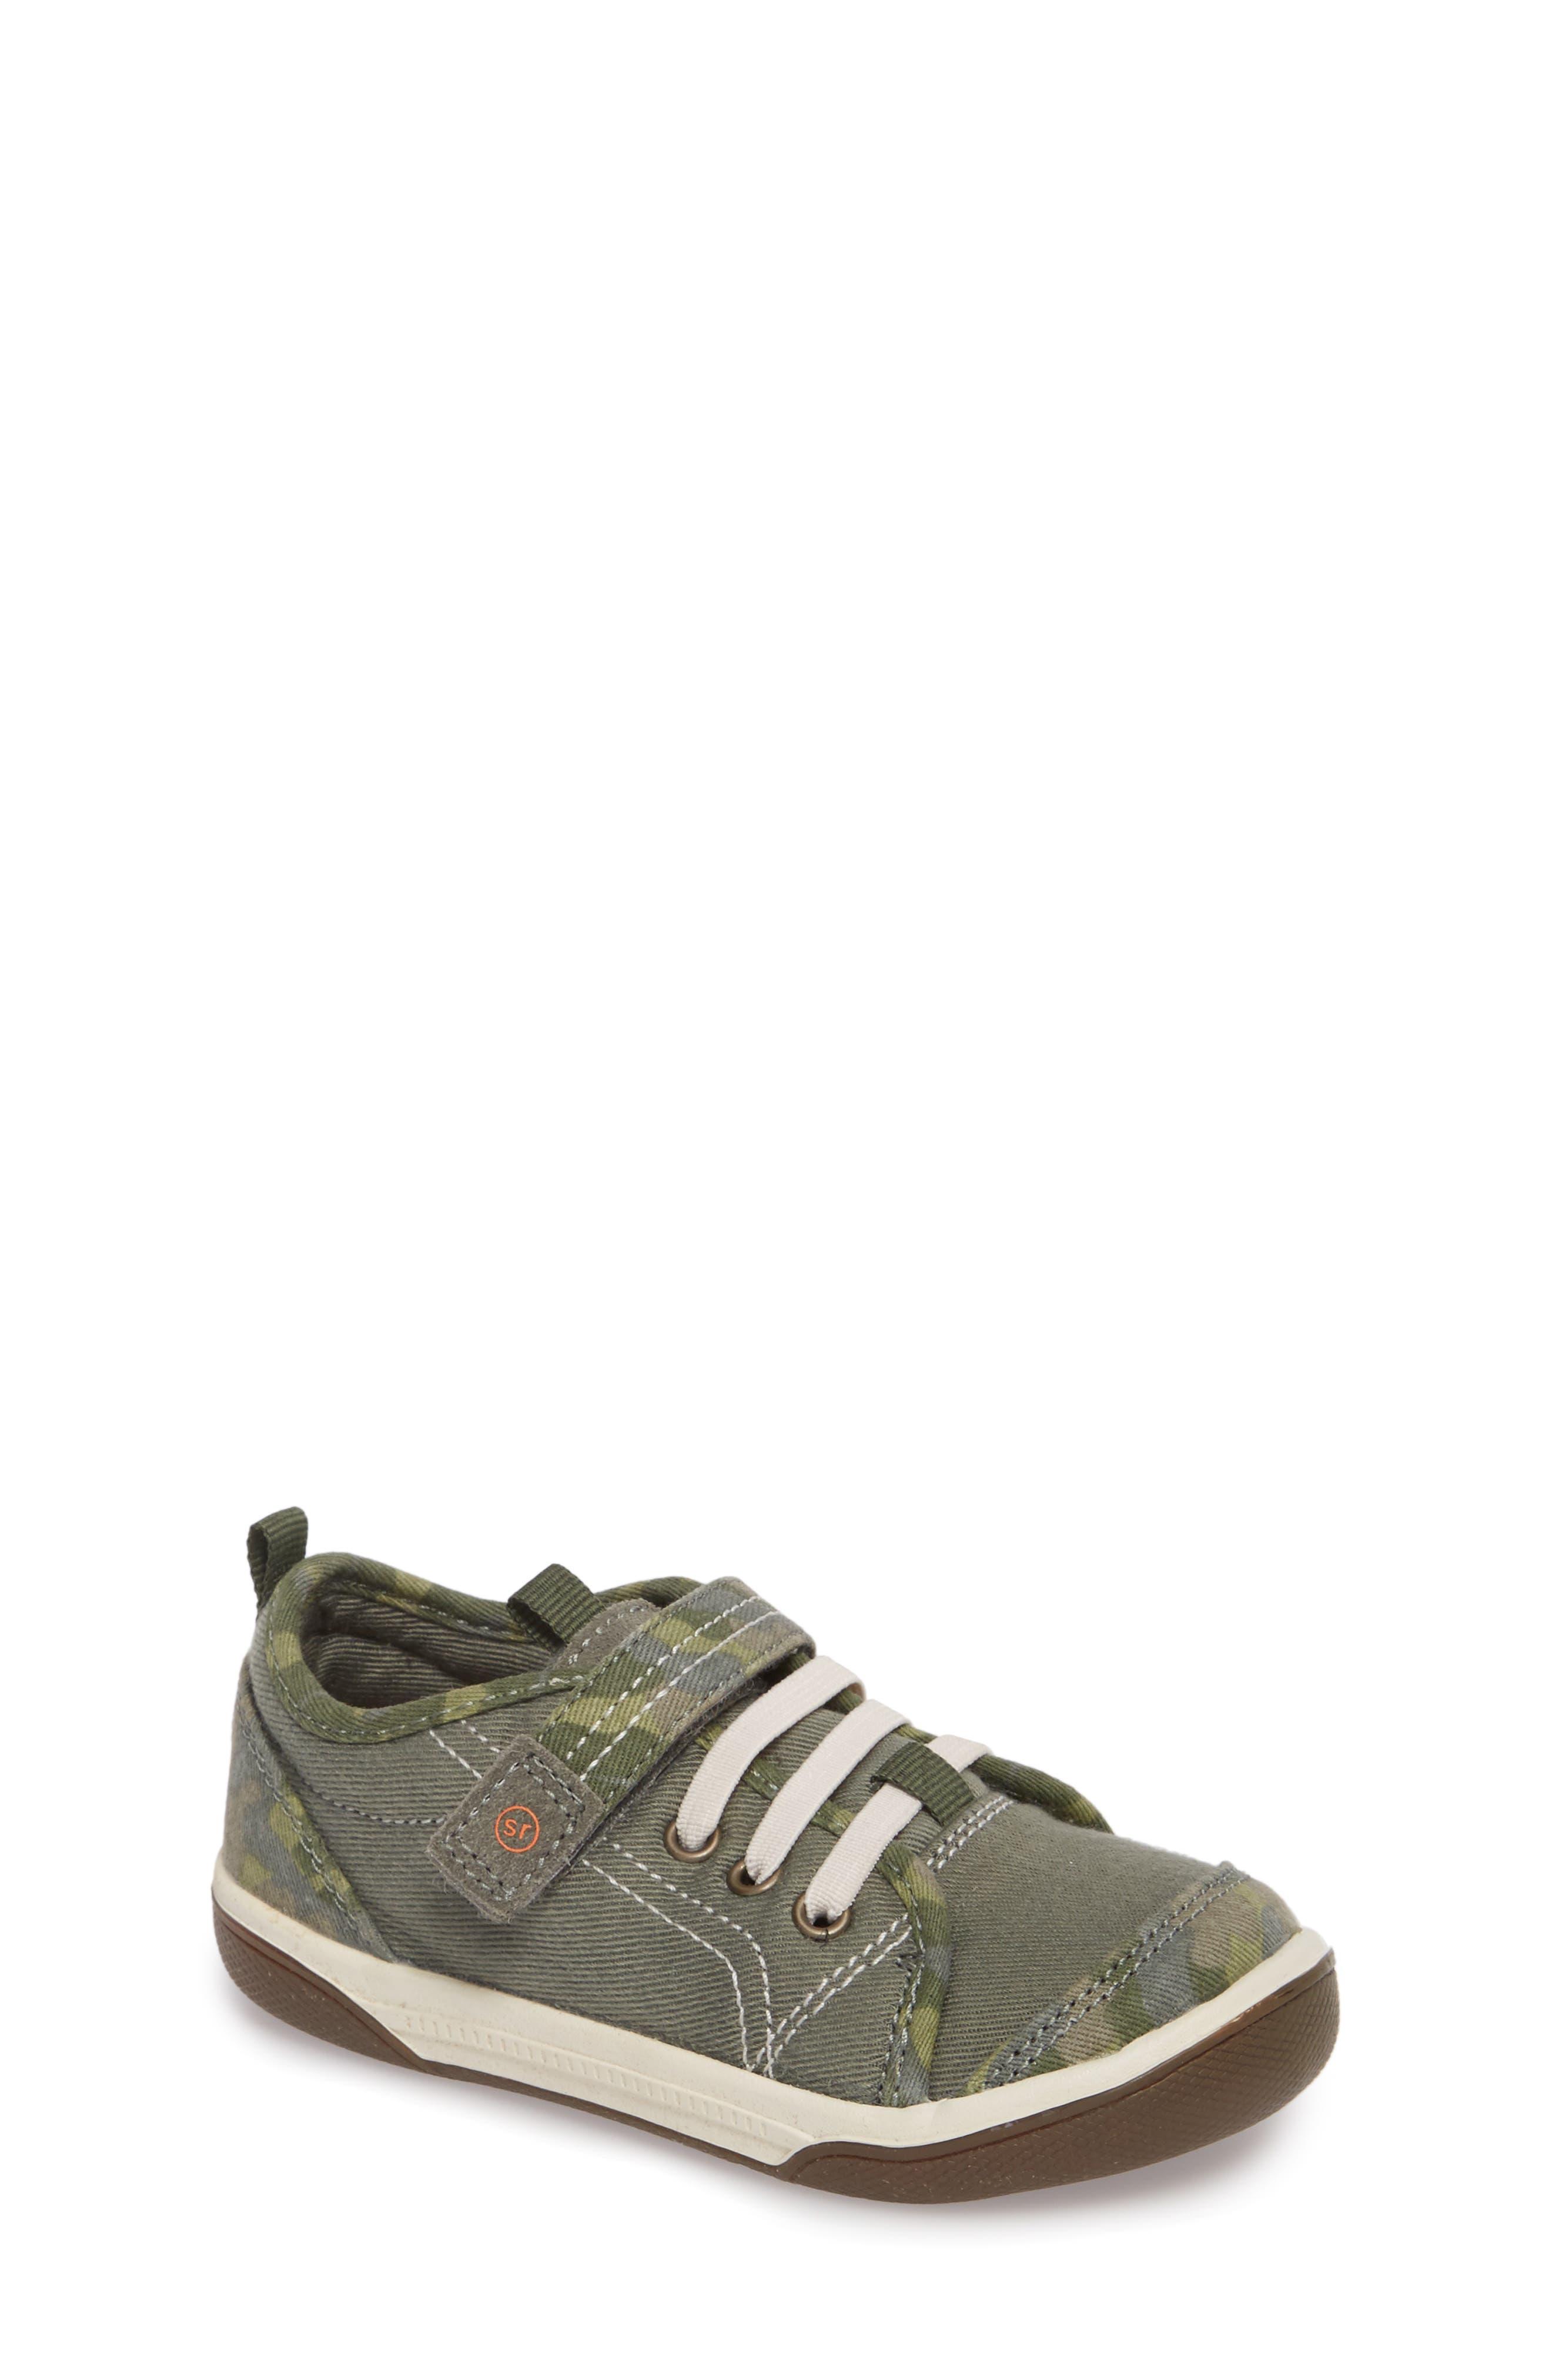 Main Image - Stride Rite Dakota Sneaker (Baby, Walker & Toddler)